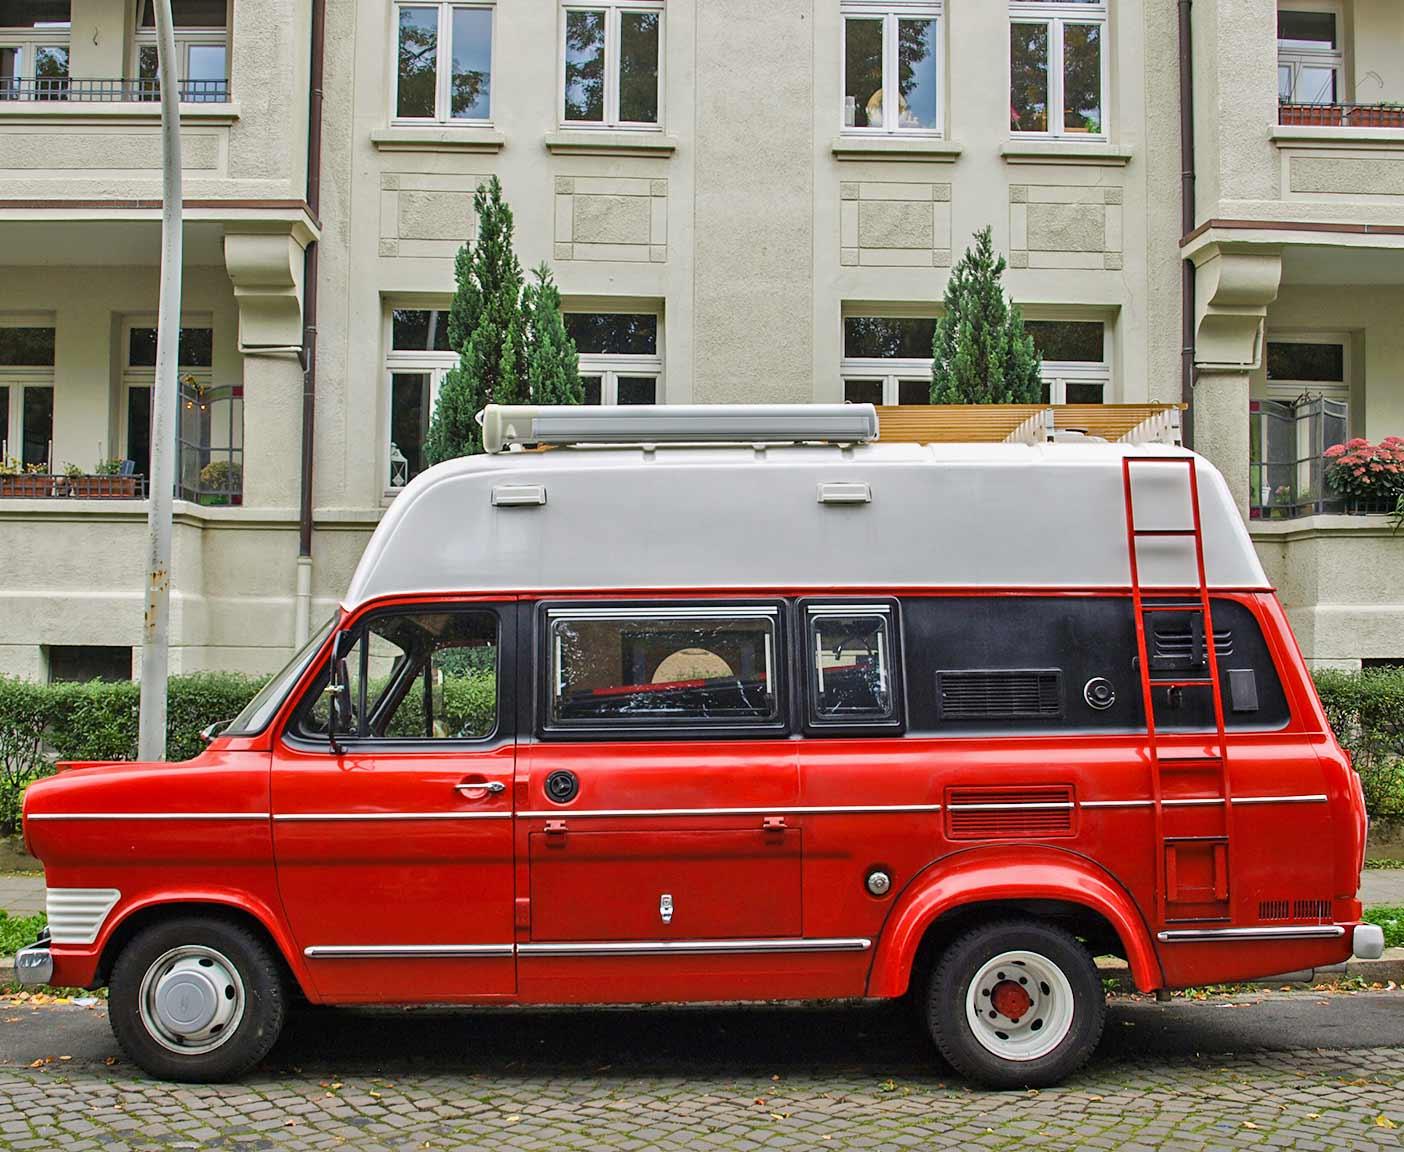 Ford Transit MK9 als Camper - Oldtimer Wohnmobil im Selbstausbau